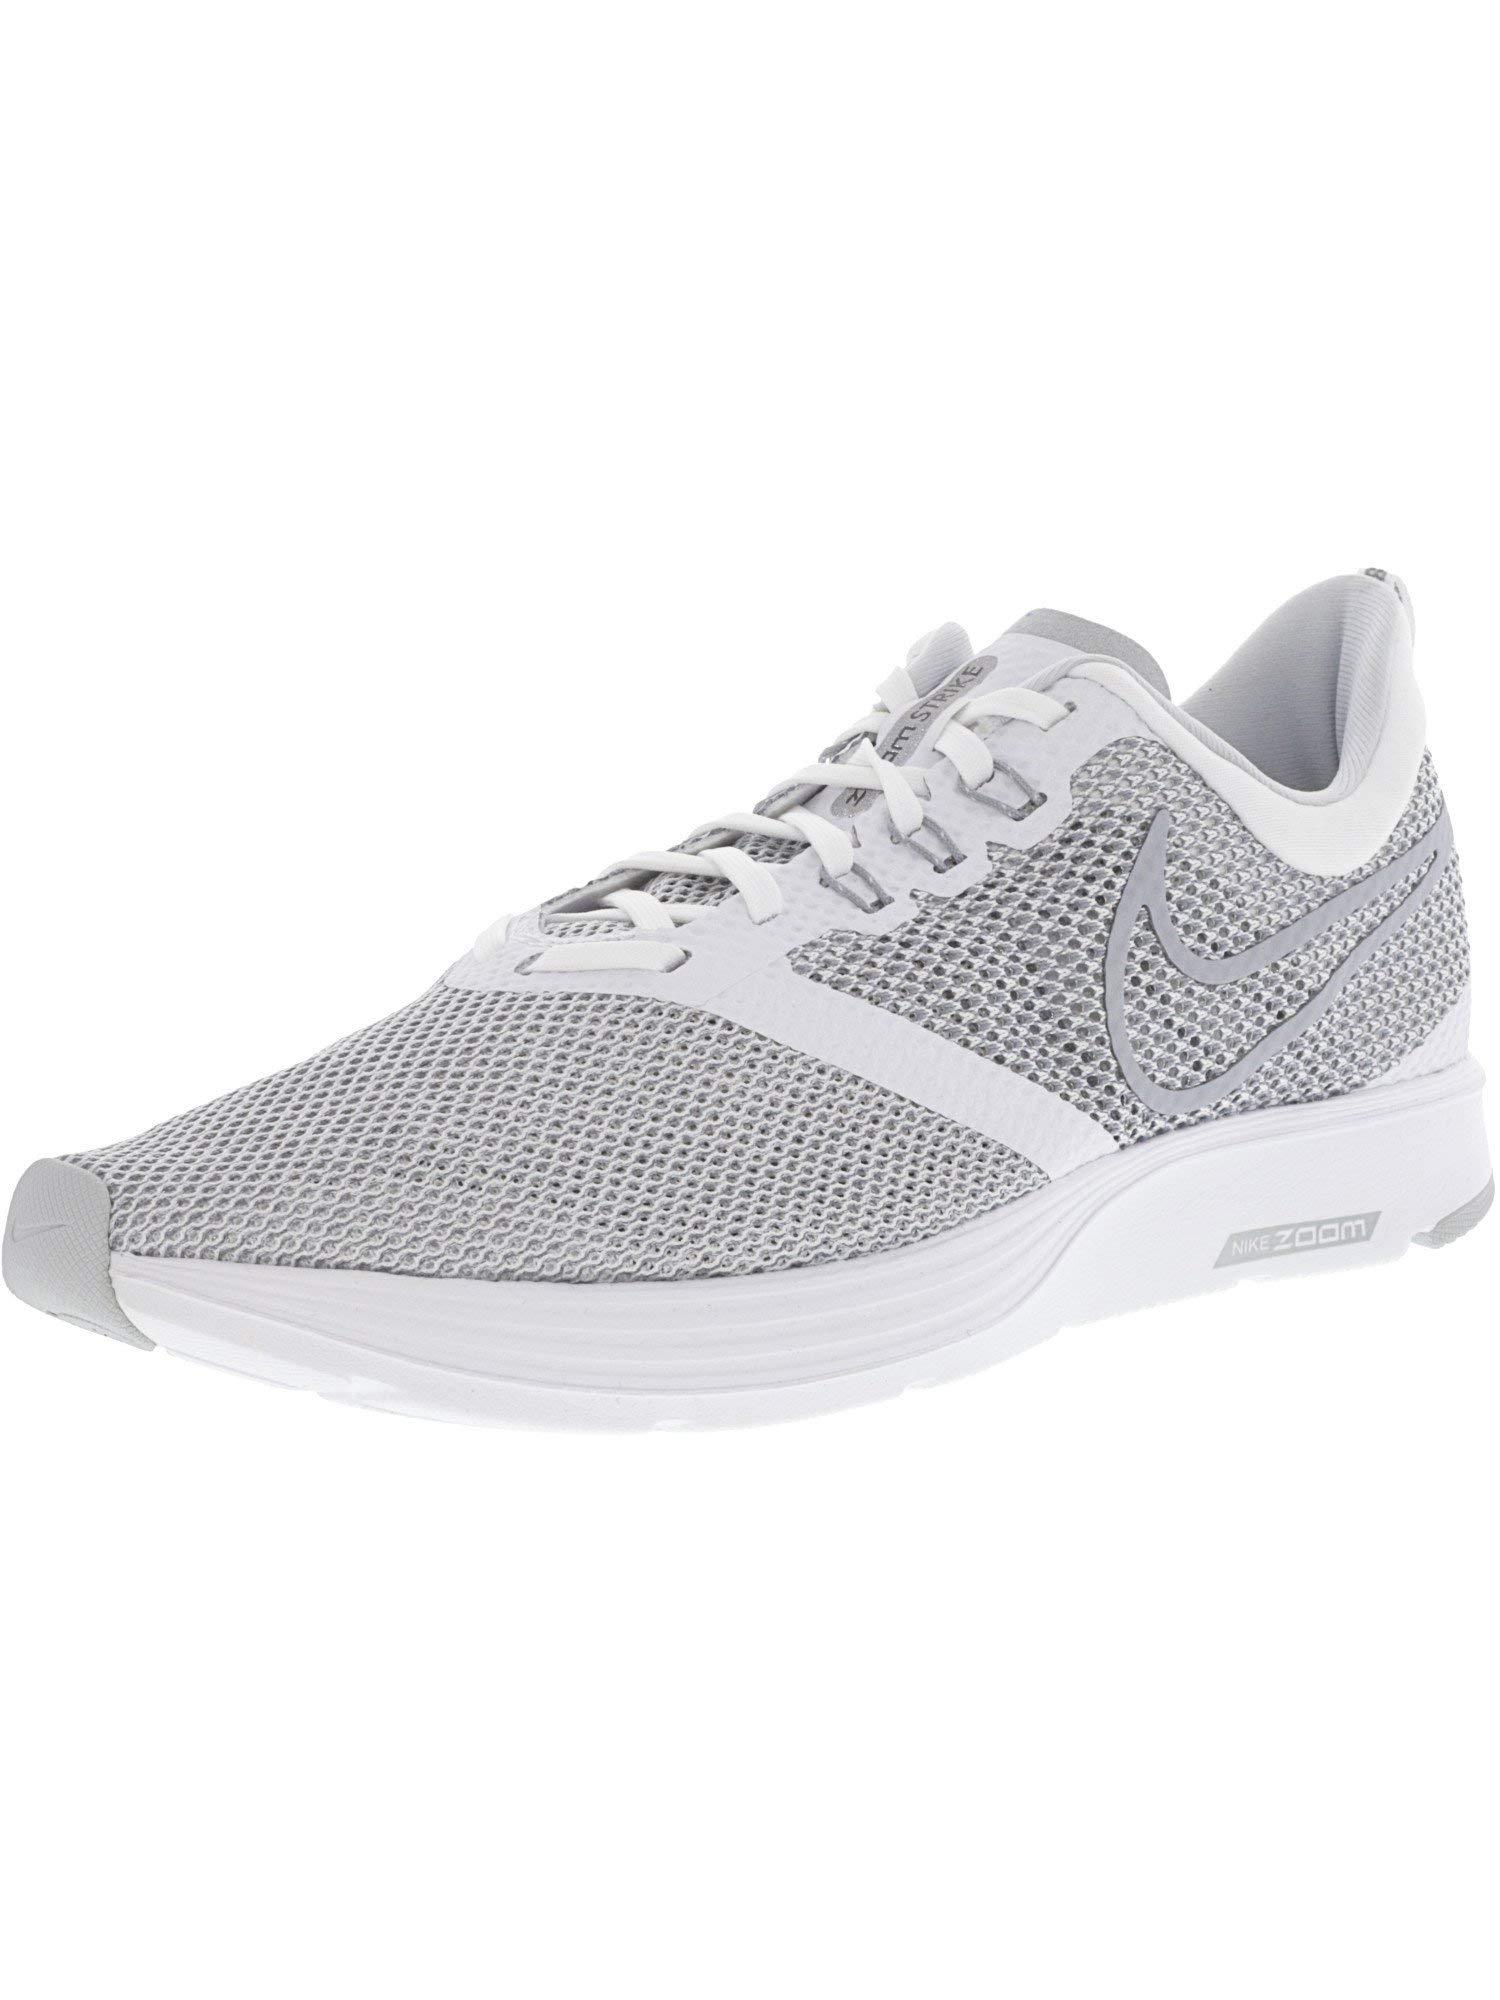 c4d57cab101d0 Nike Zoom Strike Men's Running Shoe (8 D US, White/Wolf Grey)